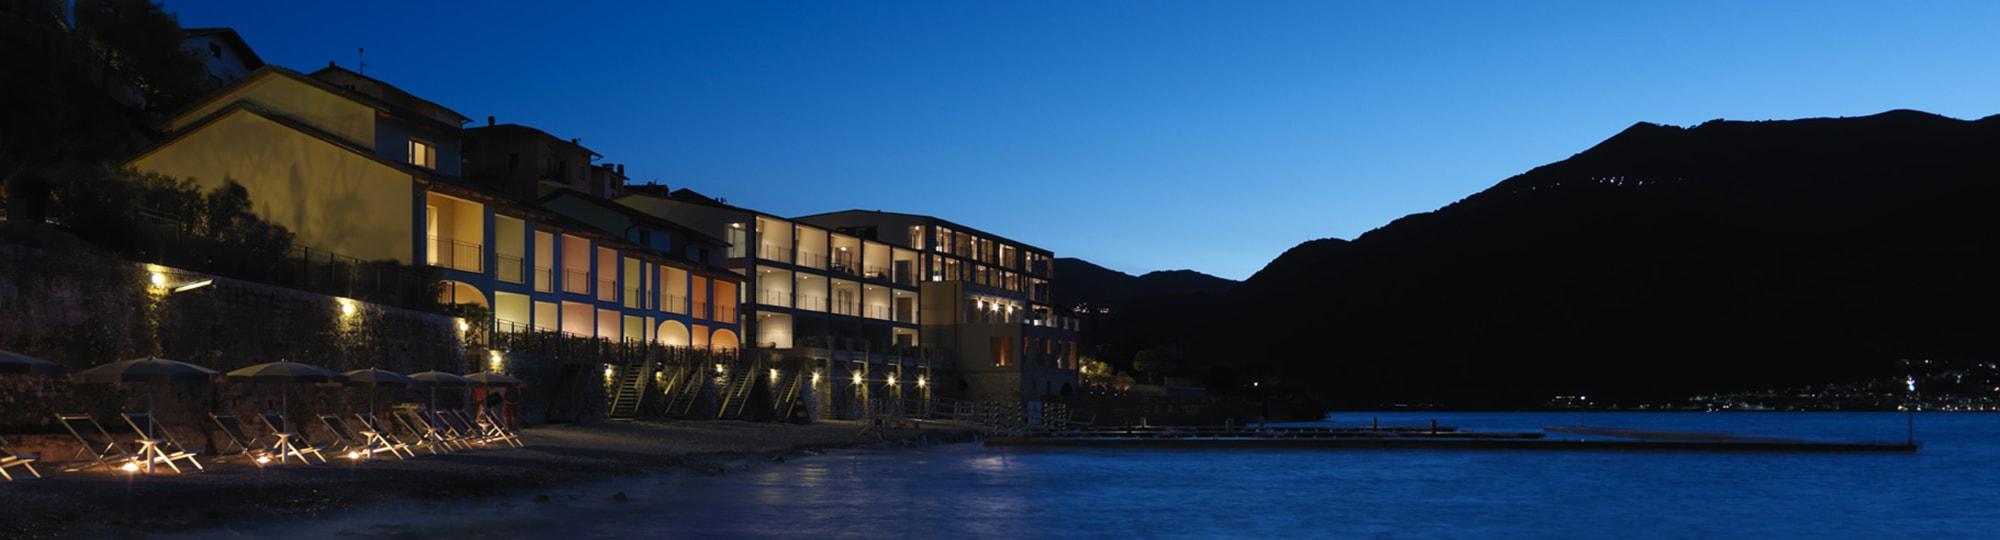 filario hotel residences 4 r server l 39 h tel filario. Black Bedroom Furniture Sets. Home Design Ideas